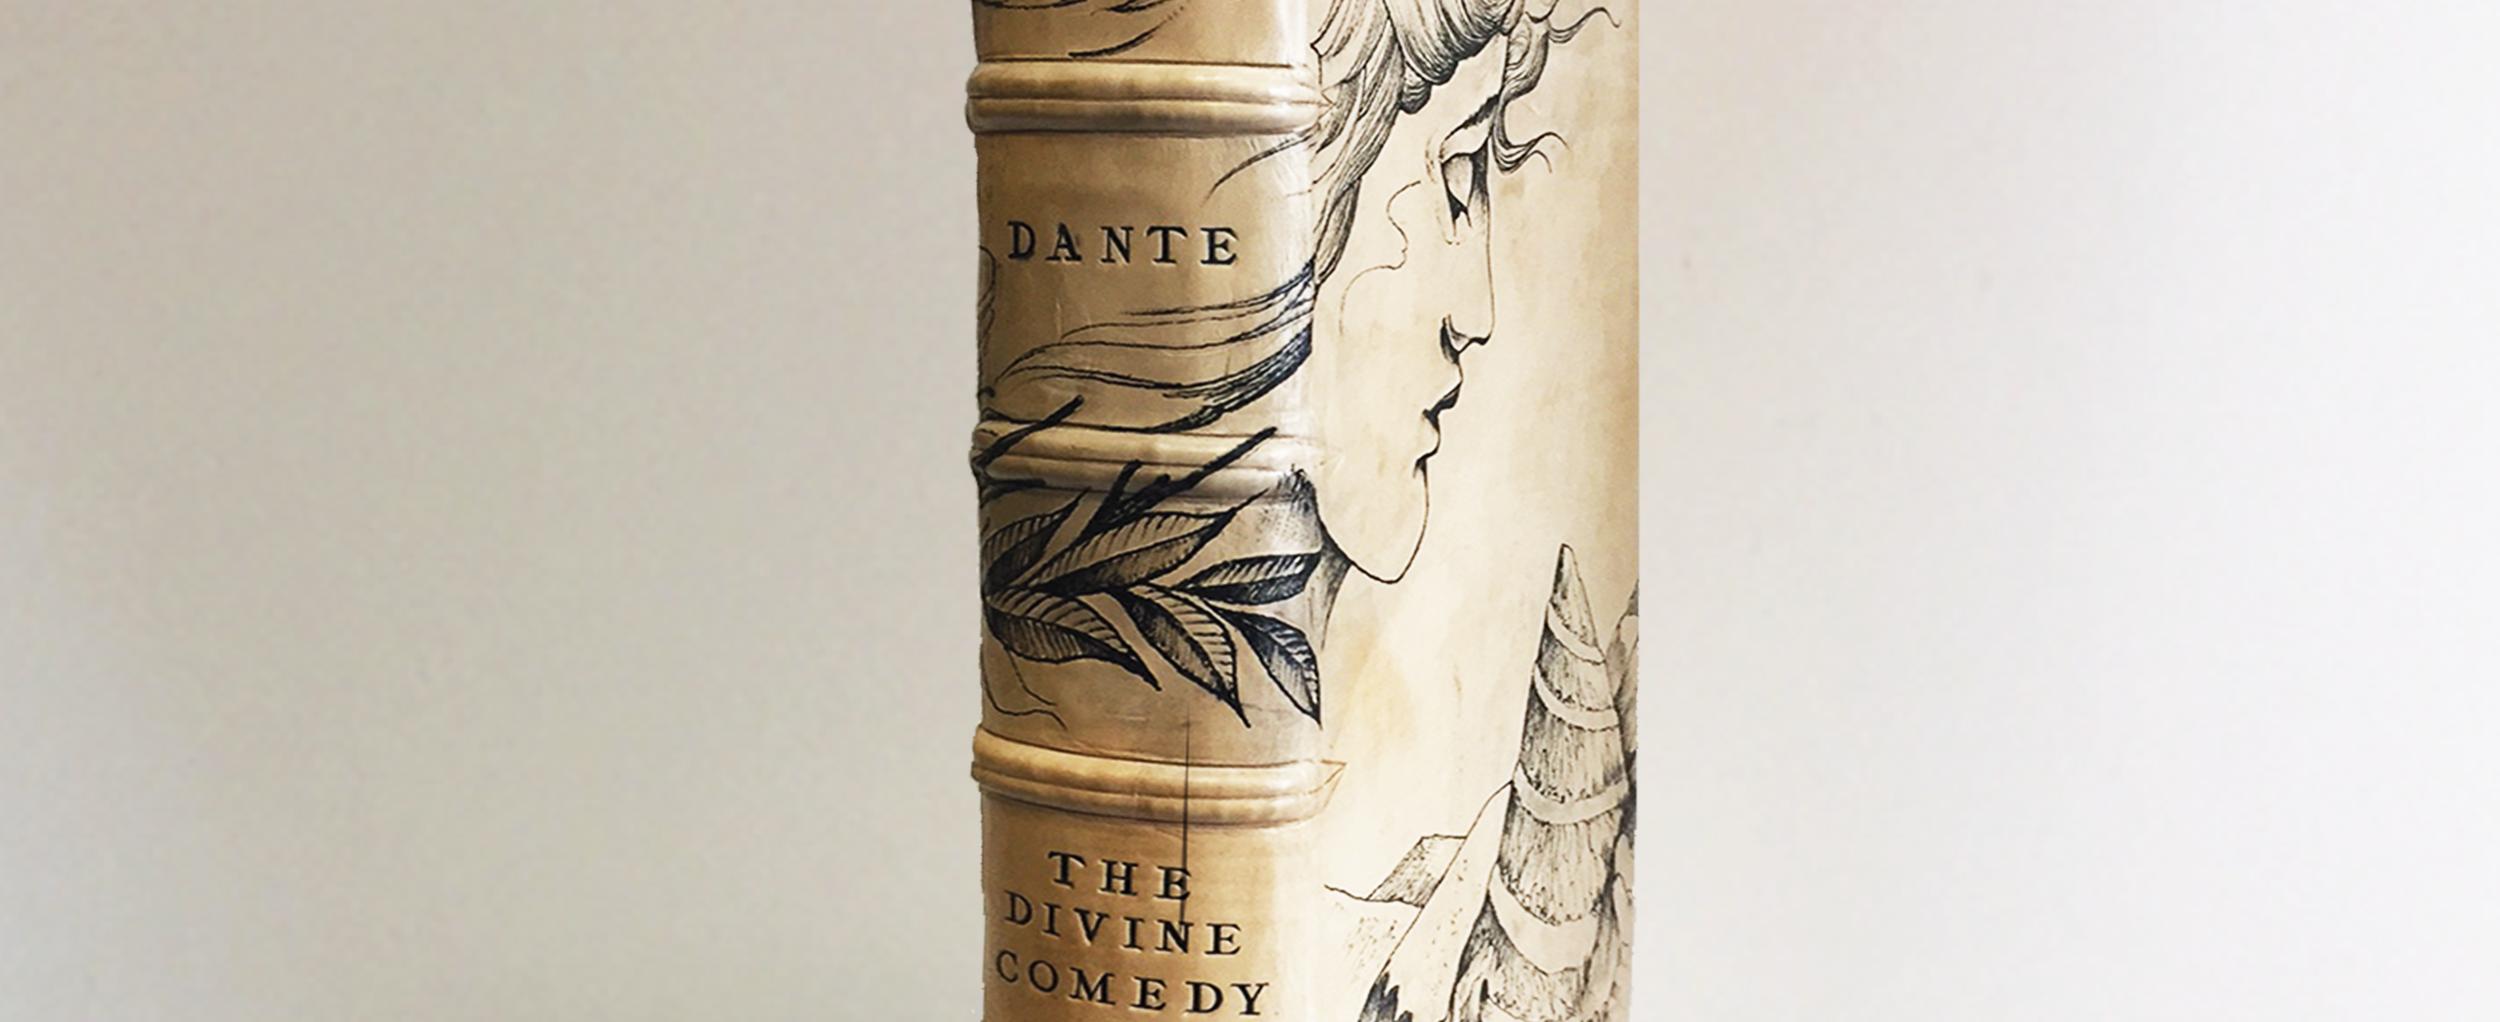 Dante-spine-2.png